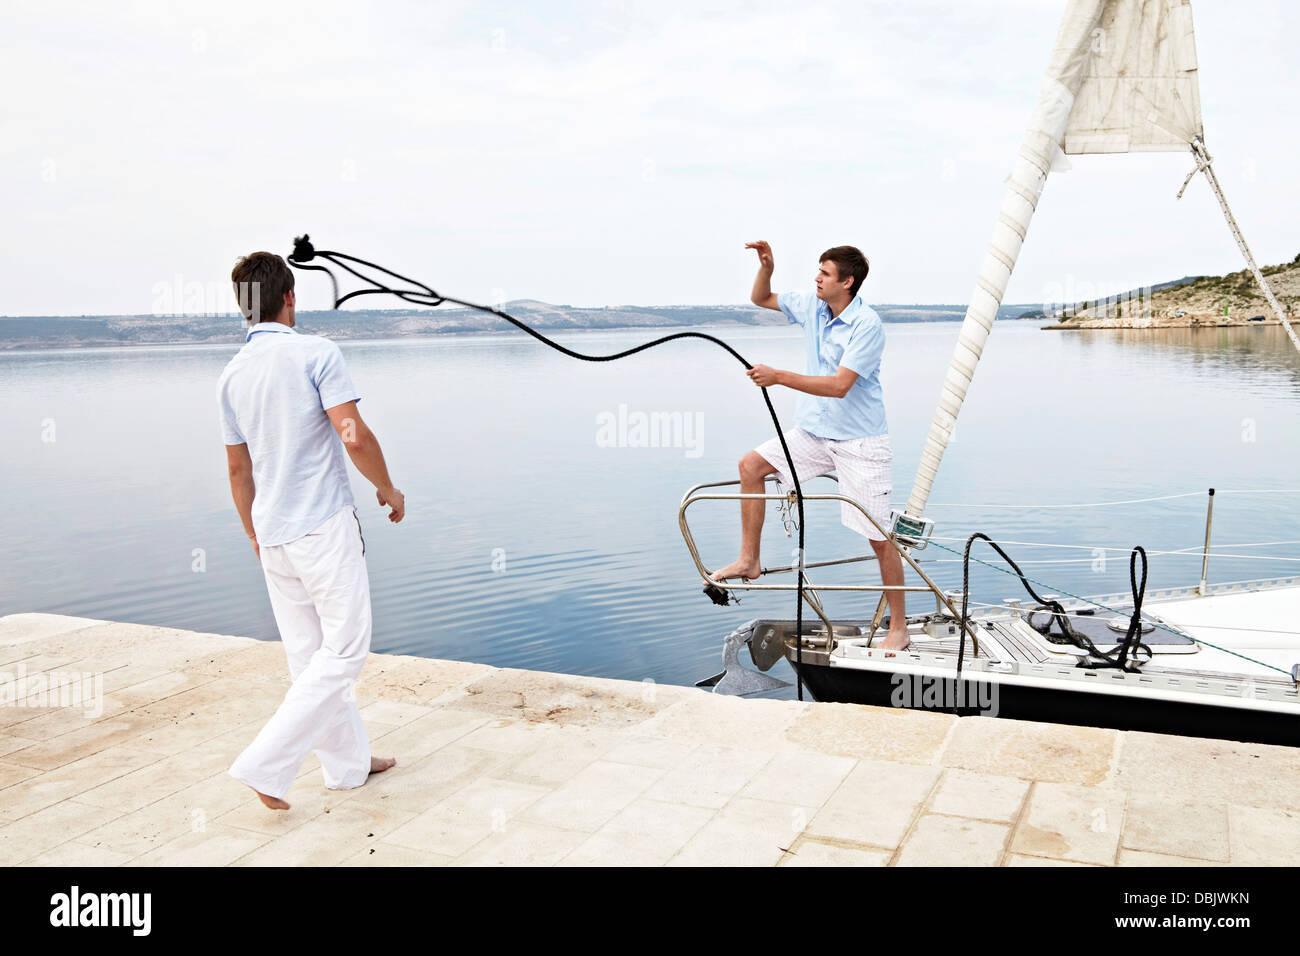 Croatia, Sailboat entering port, Two young men fixing rope Stock Photo